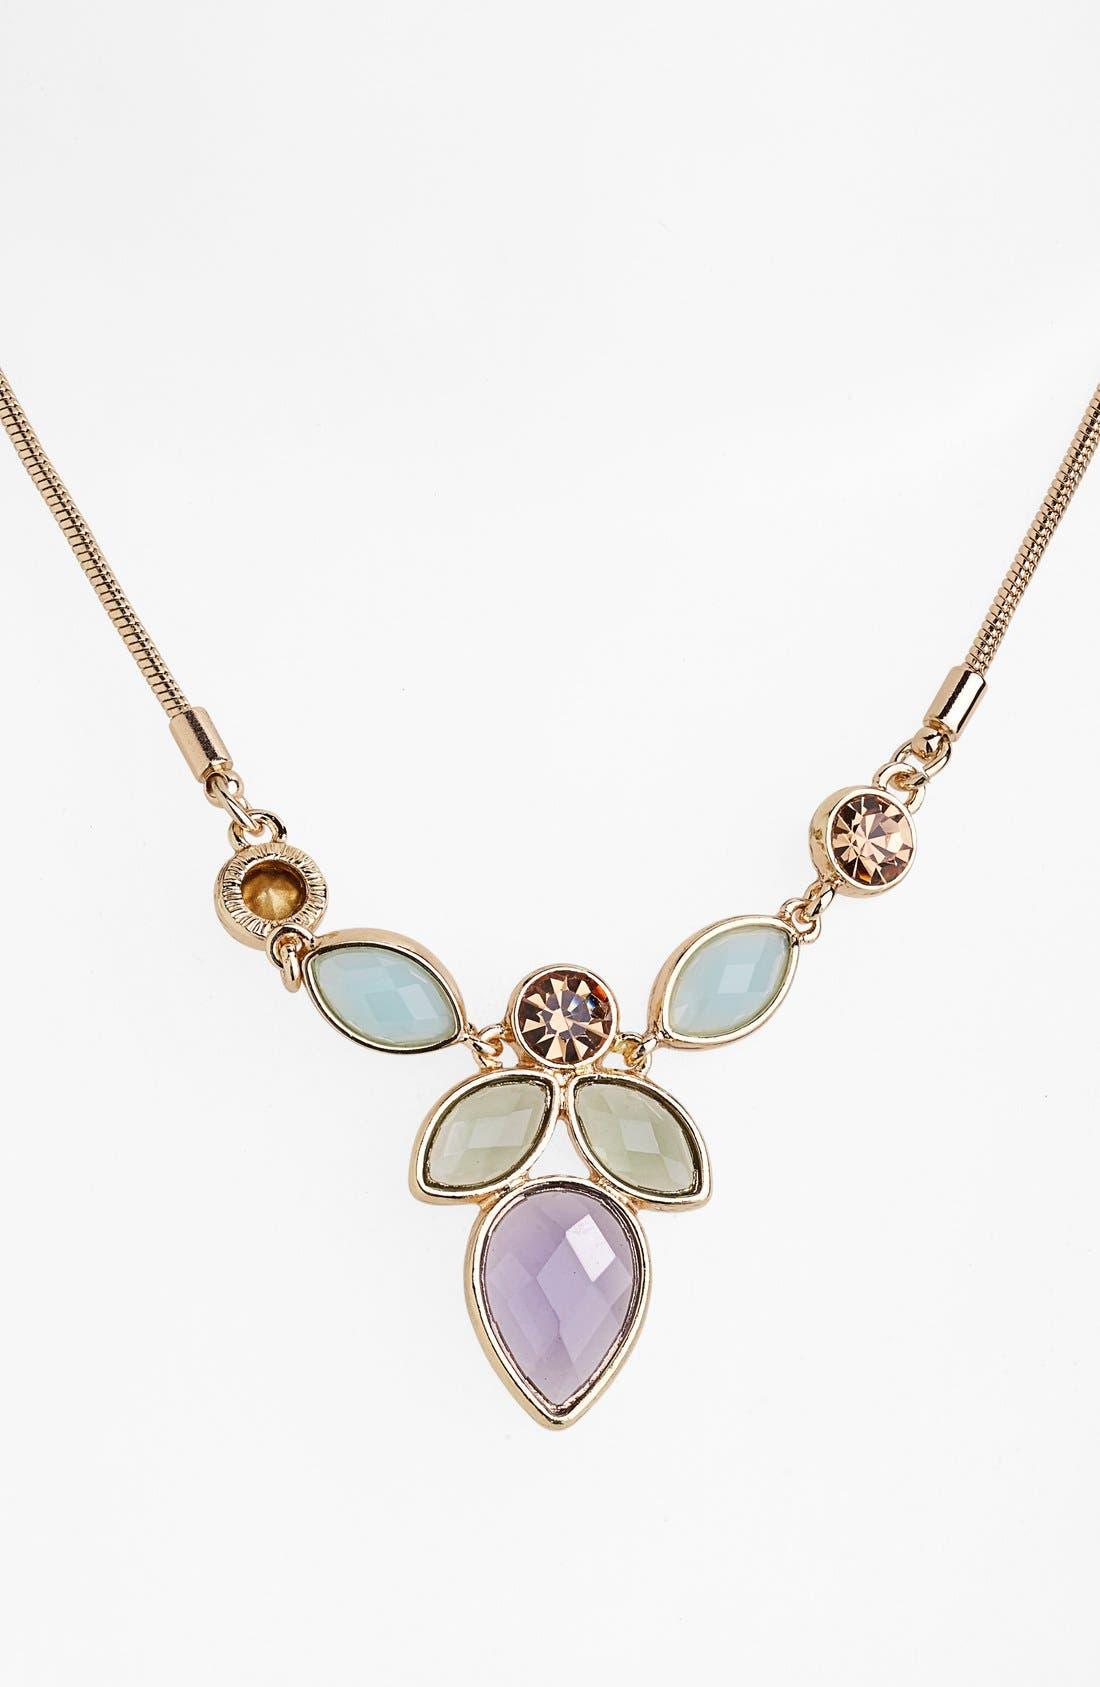 Main Image - Anne Klein Multi Stone Pendant Necklace